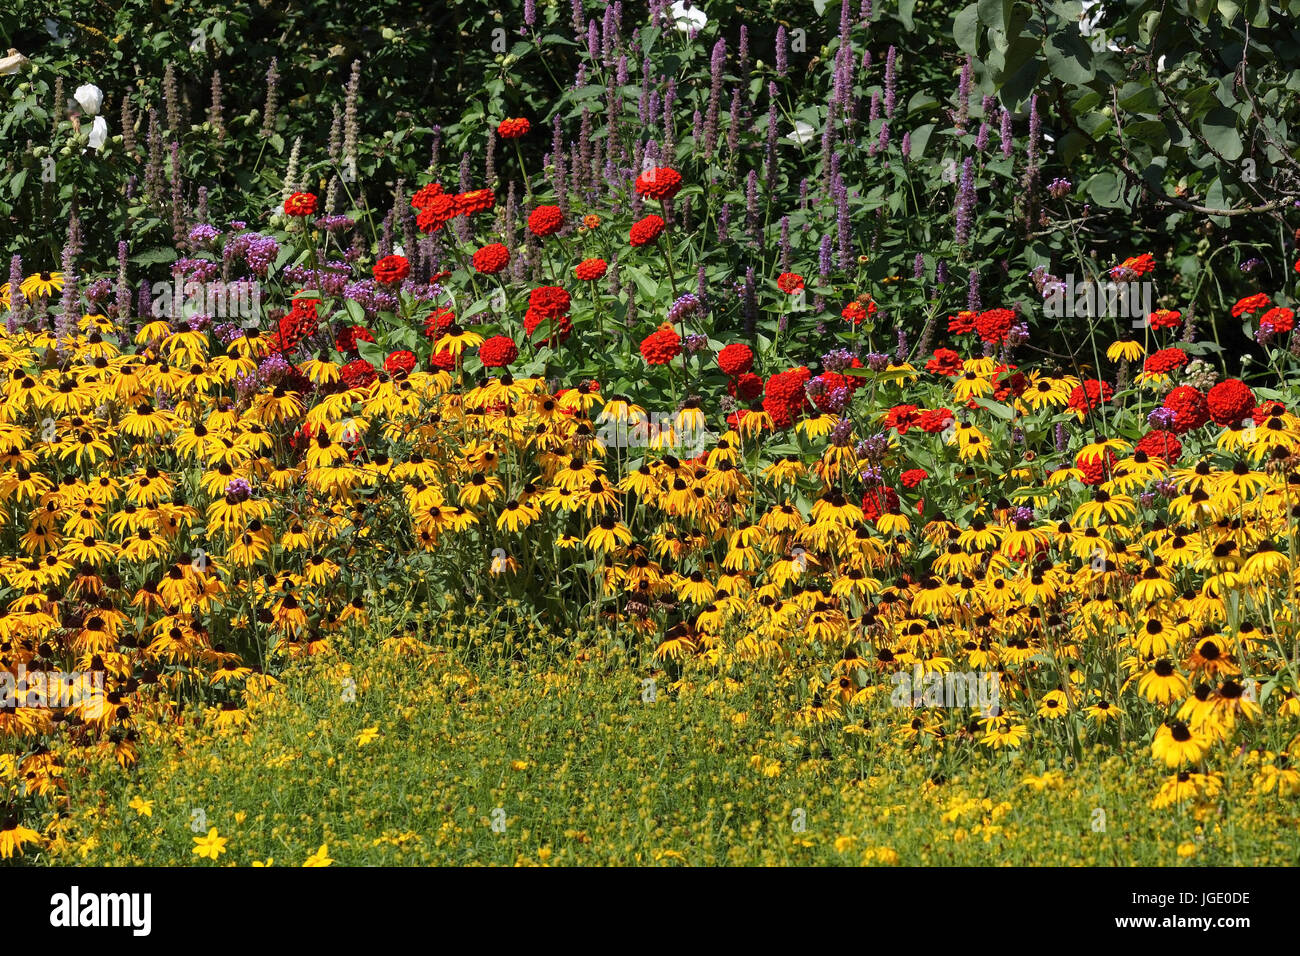 Solar hat and red zinnia, Sonnenhut und Rote Zinnie - Stock Image